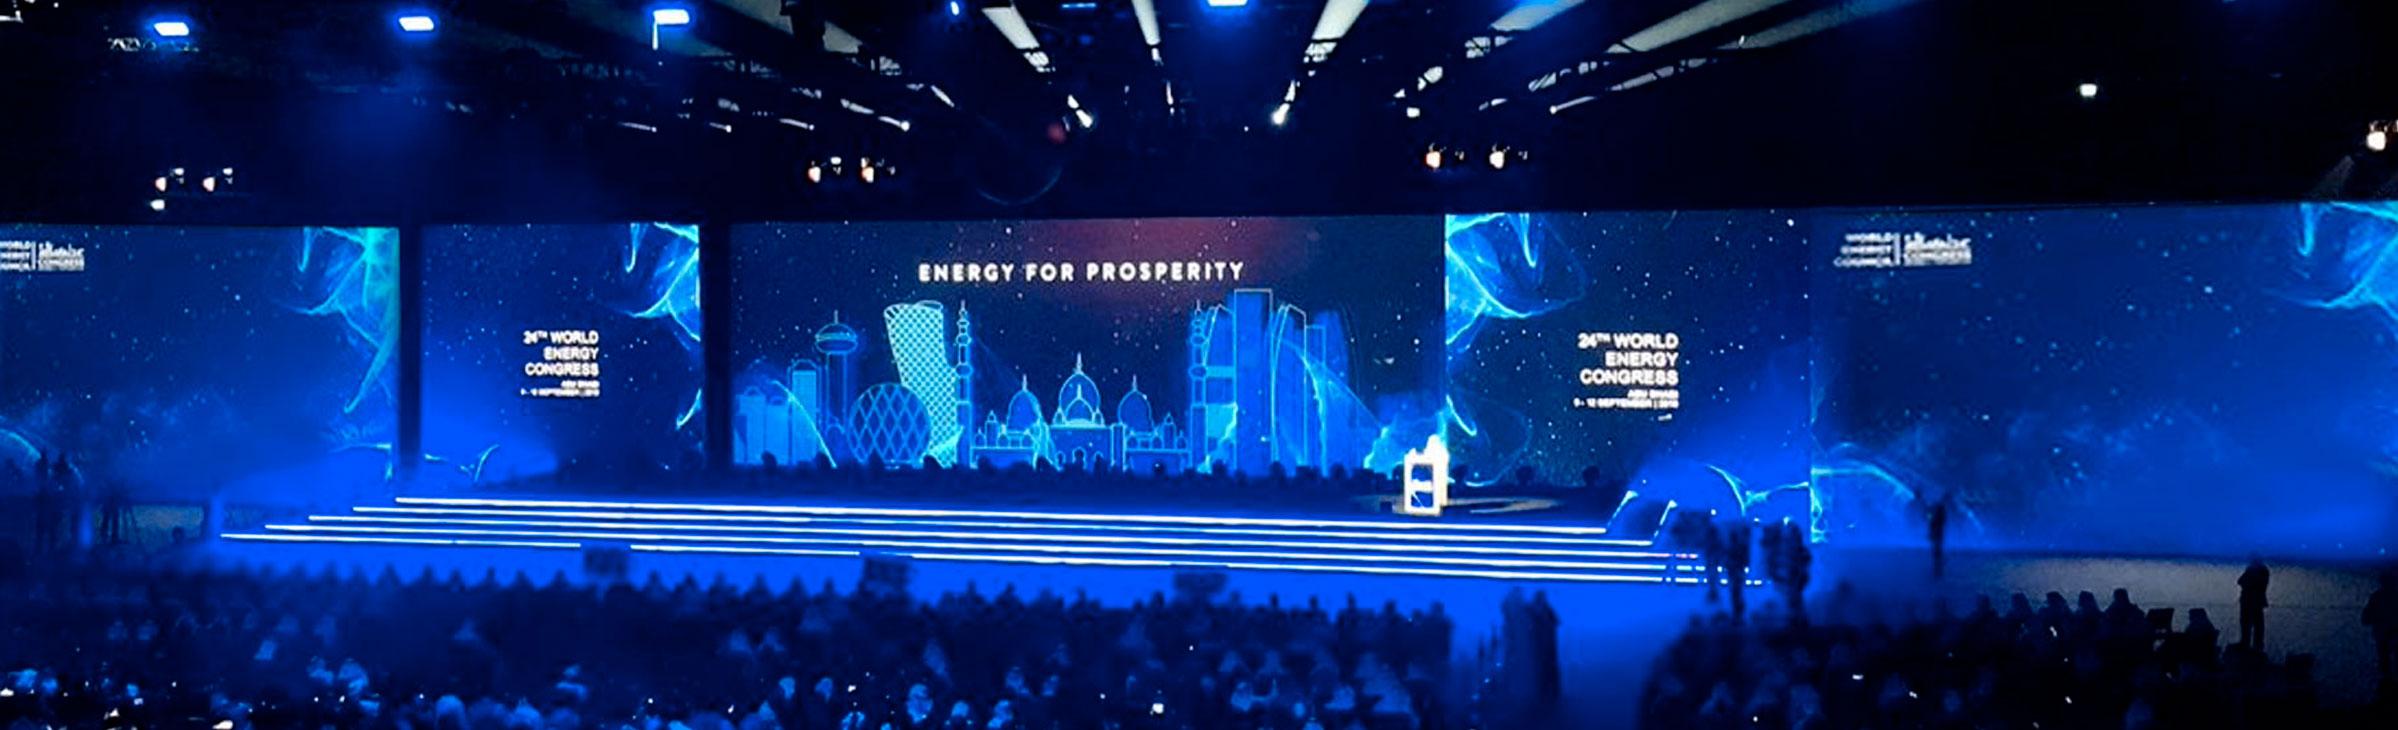 World Energy Congress Opening Ceremony Show